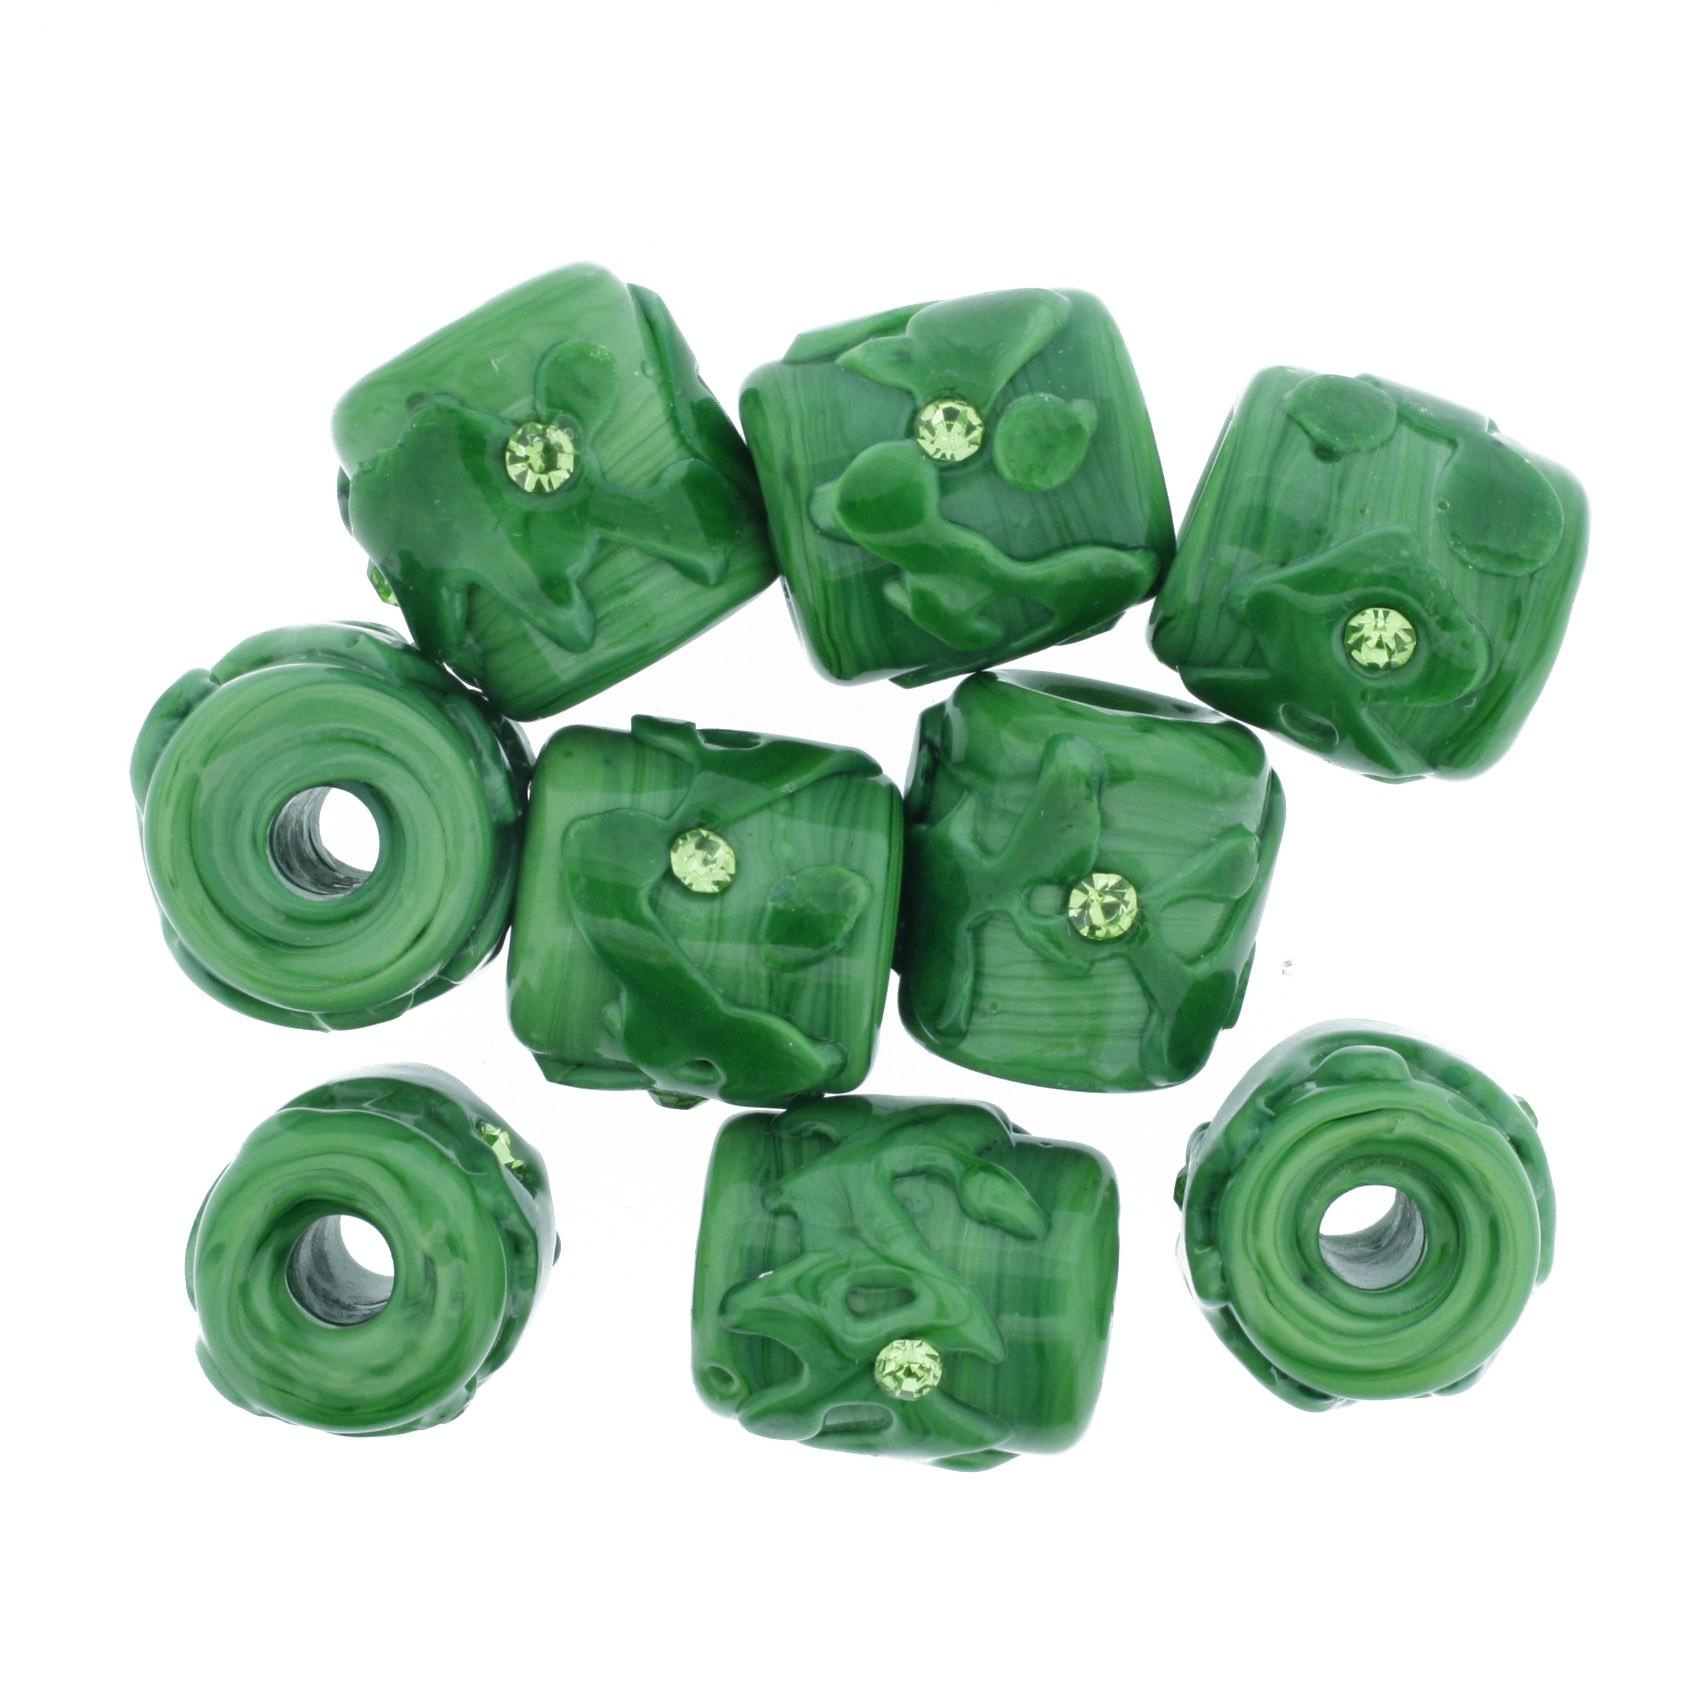 Firmas Strass - Verde  - Stéphanie Bijoux® - Peças para Bijuterias e Artesanato